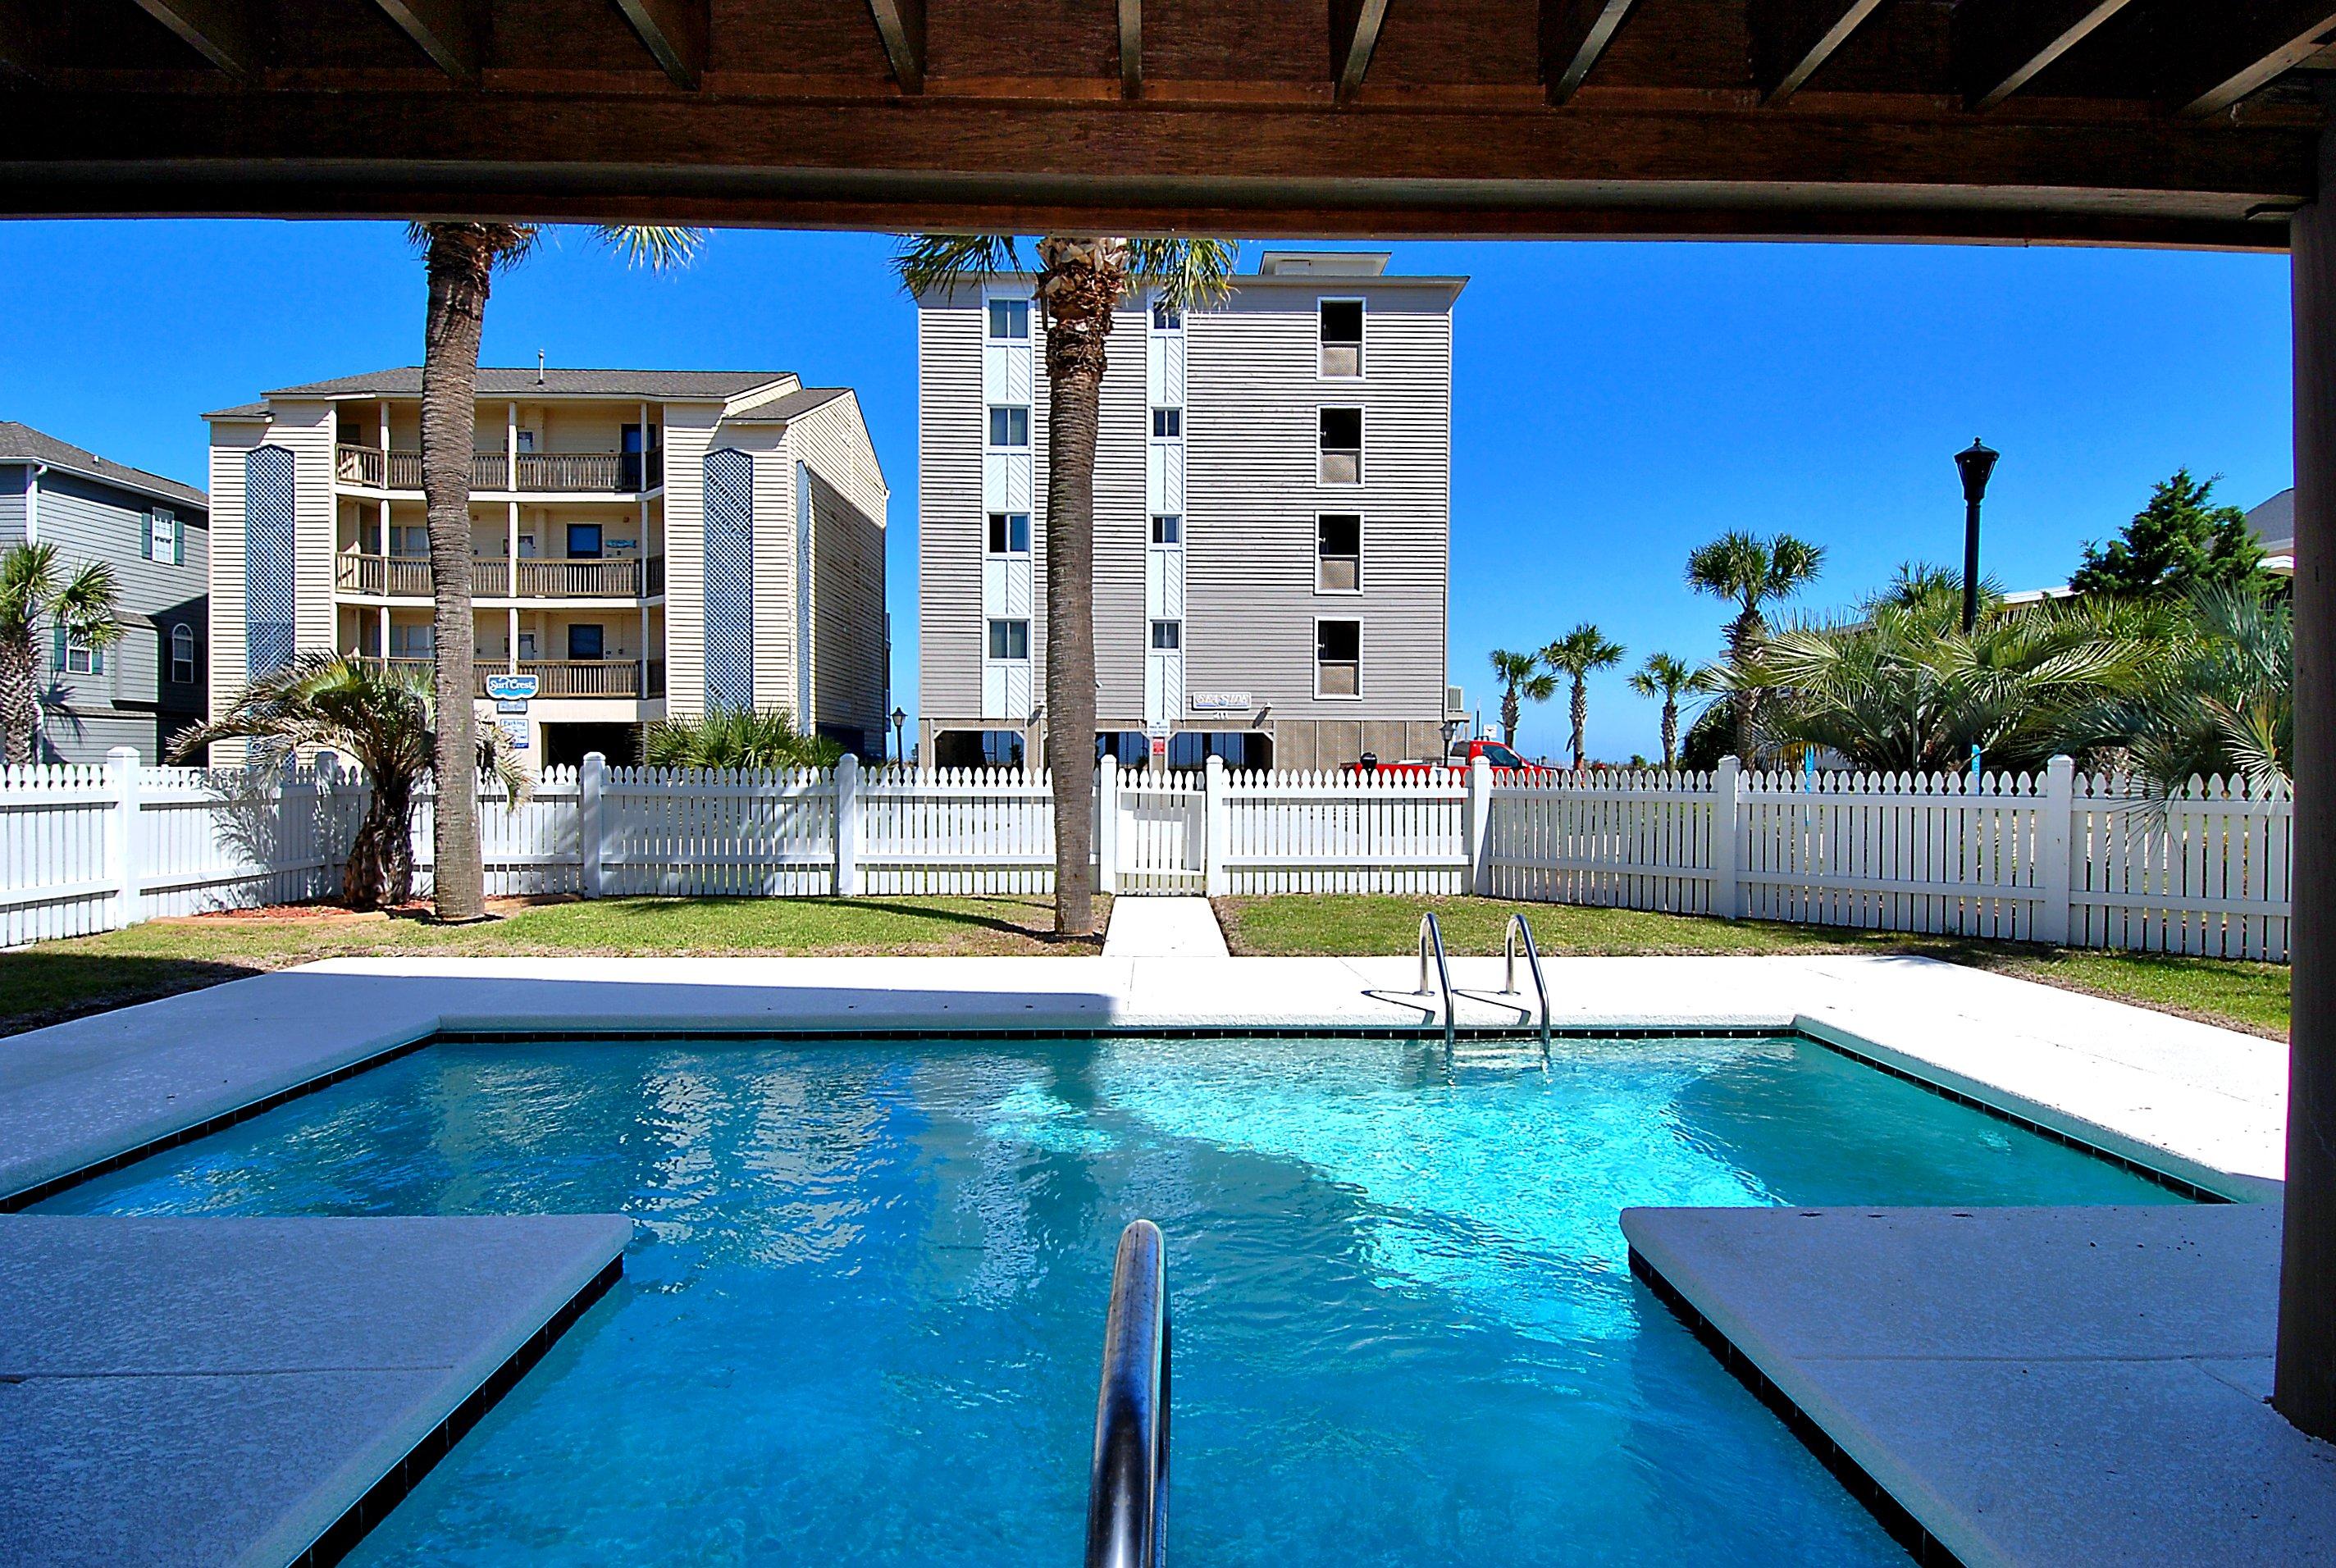 100 House Rentals Surfside Beach Sc Garden City Beach Sc Garden City Beach Condo Rentals